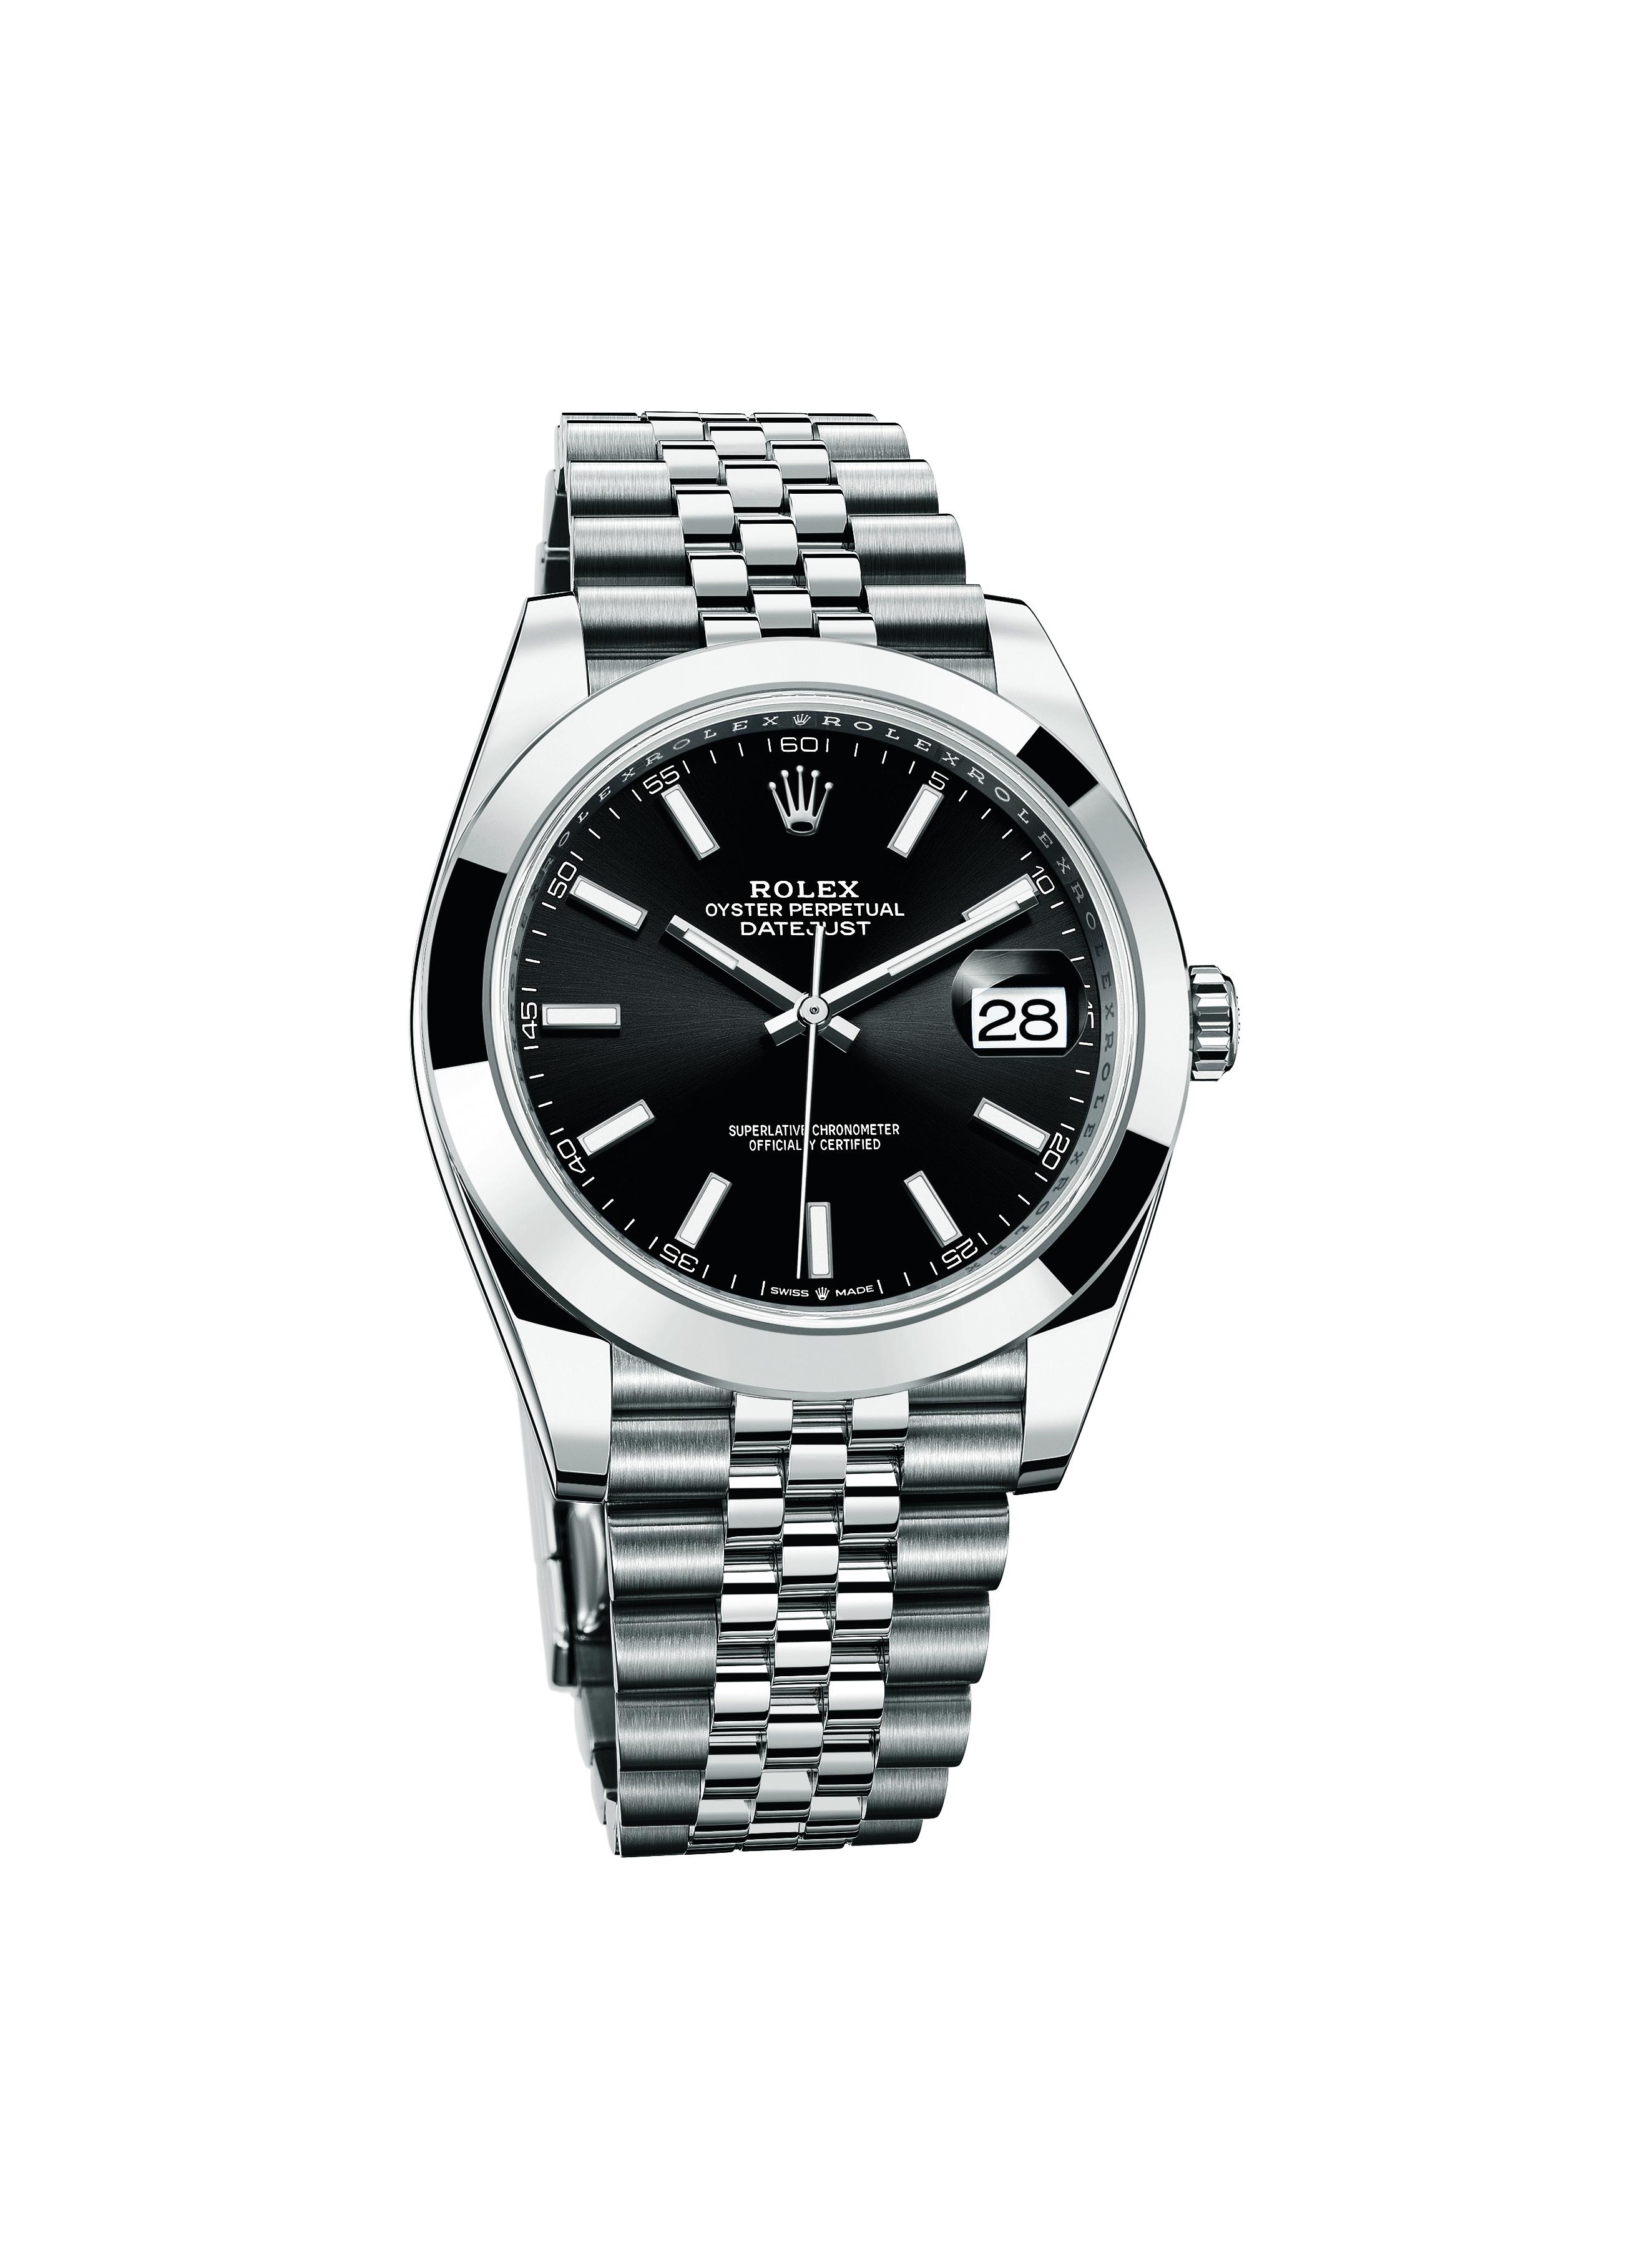 Oyster Perpetual Datejust 41精鋼腕錶($61,500, Rolex)